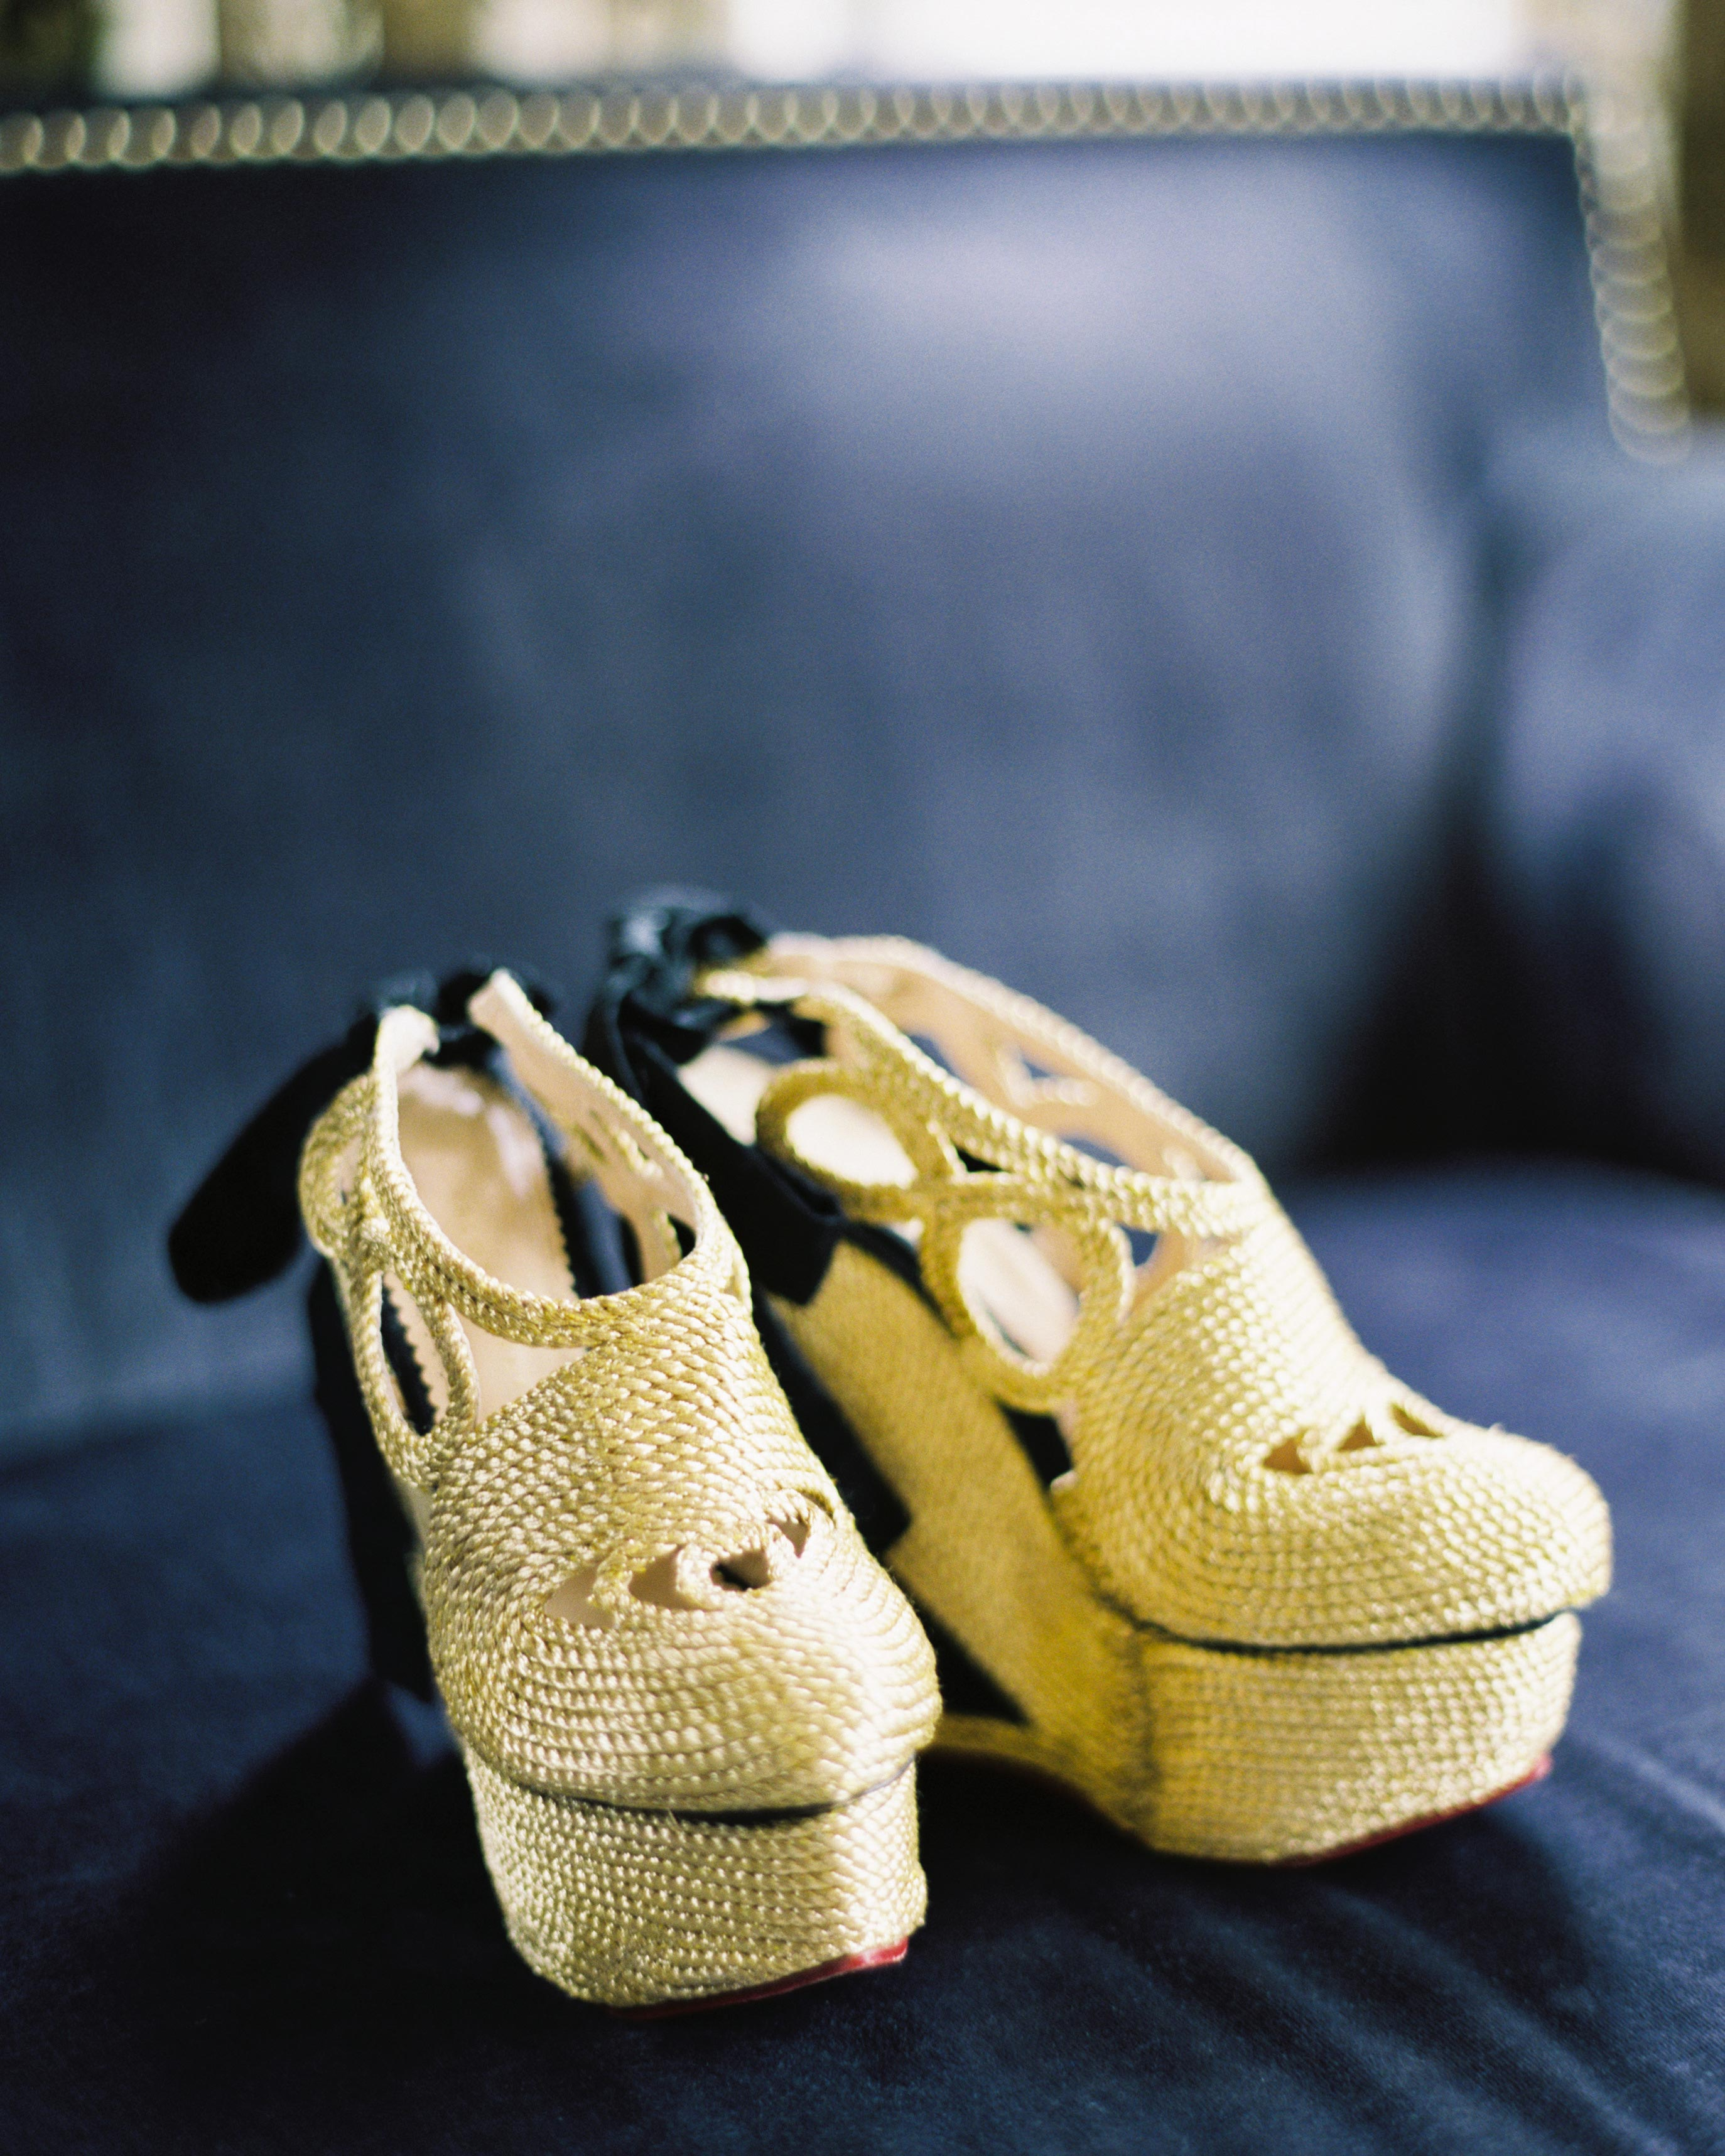 ginny-andrew-wedding-shoes-0059-s112676-0216.jpg